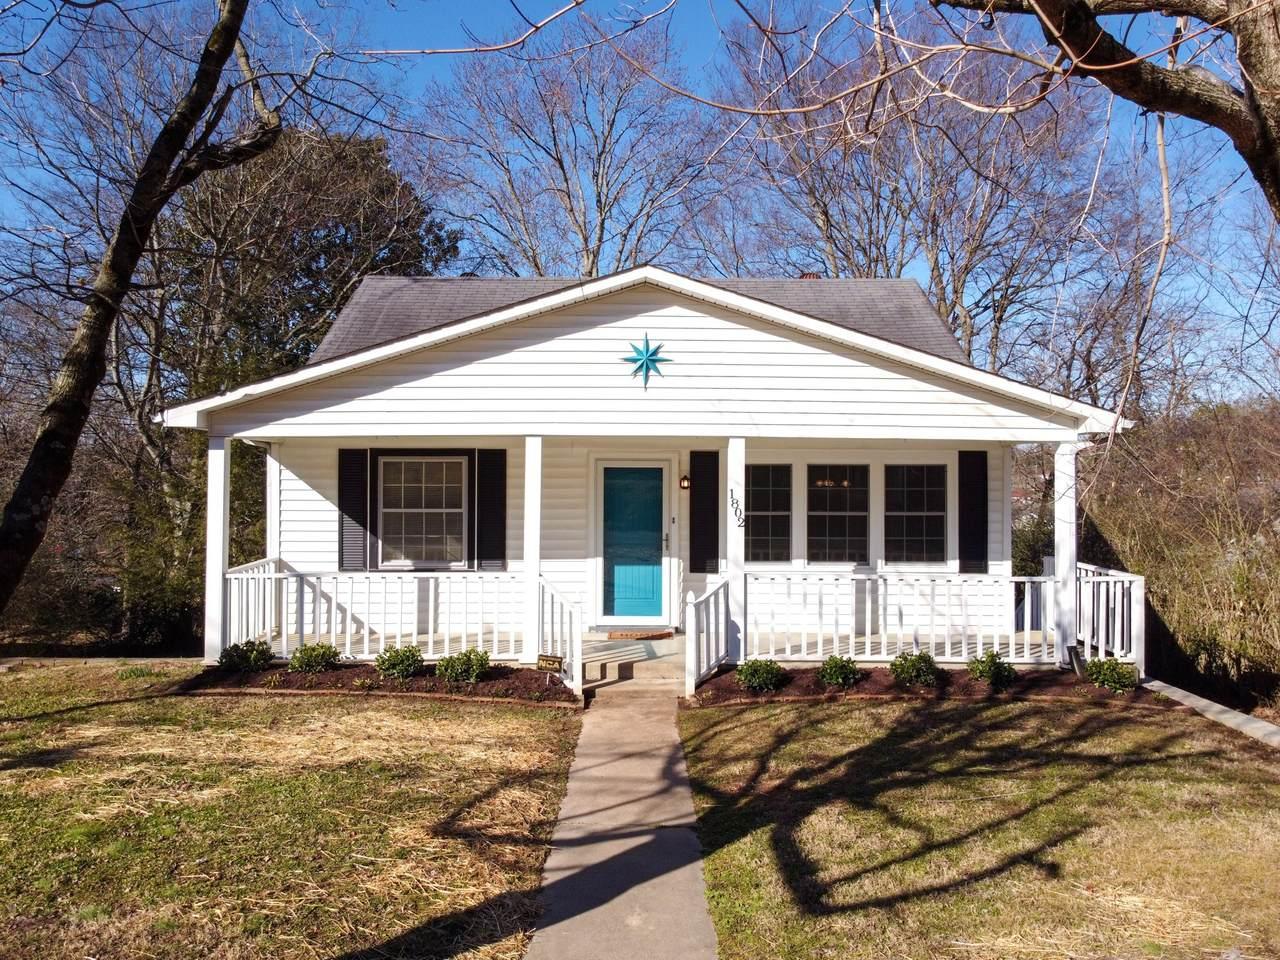 1802 Morningside Ave - Photo 1